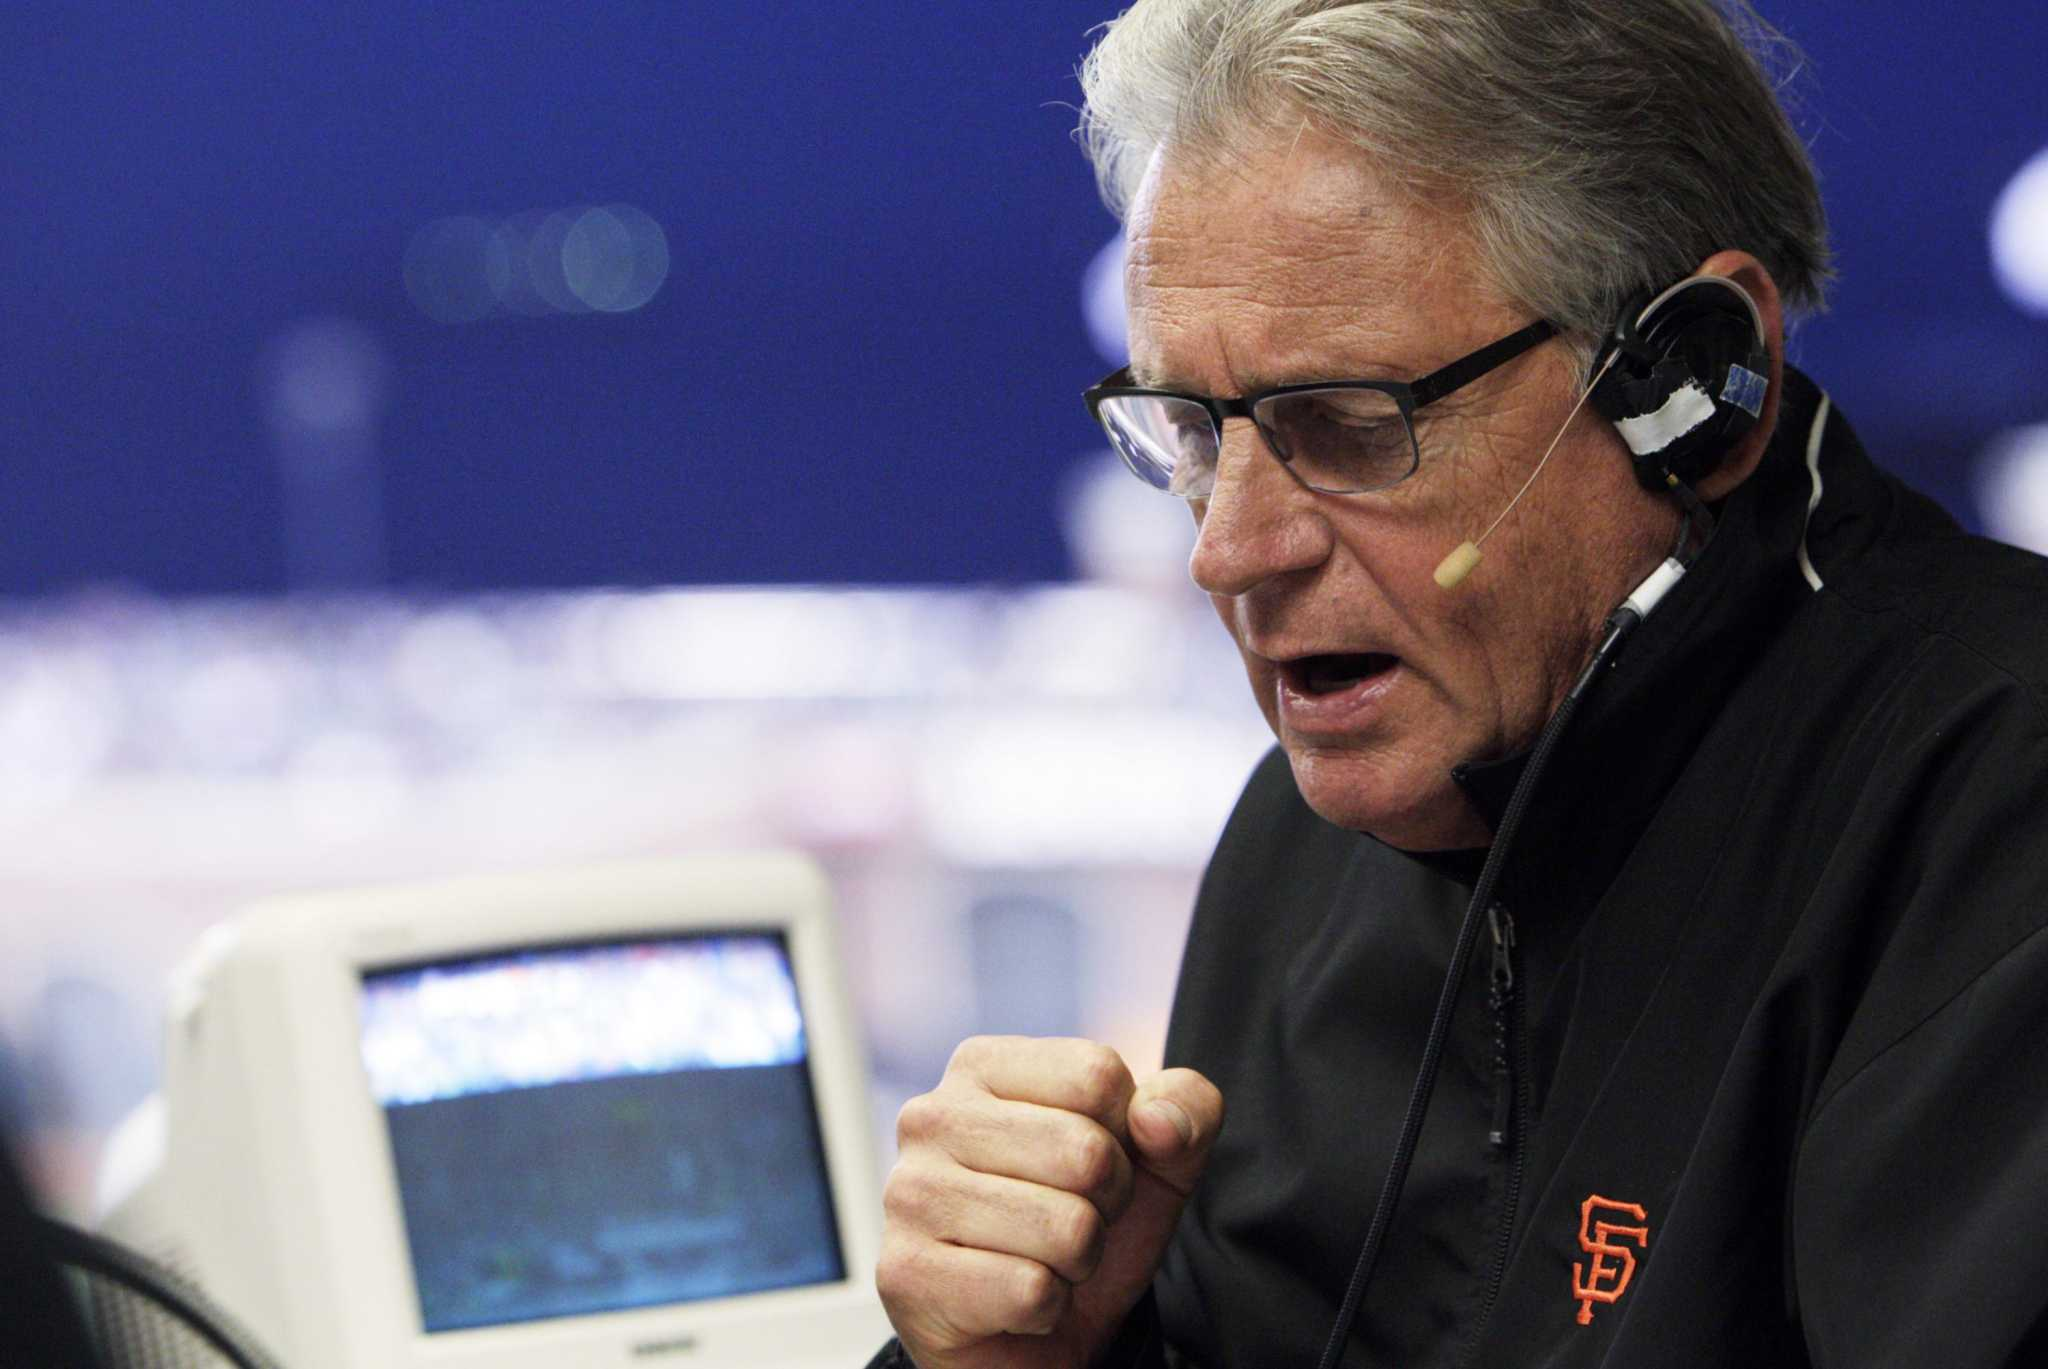 Duane Kuiper returns to Giants' broadcast booth, shocking partner Mike Krukow